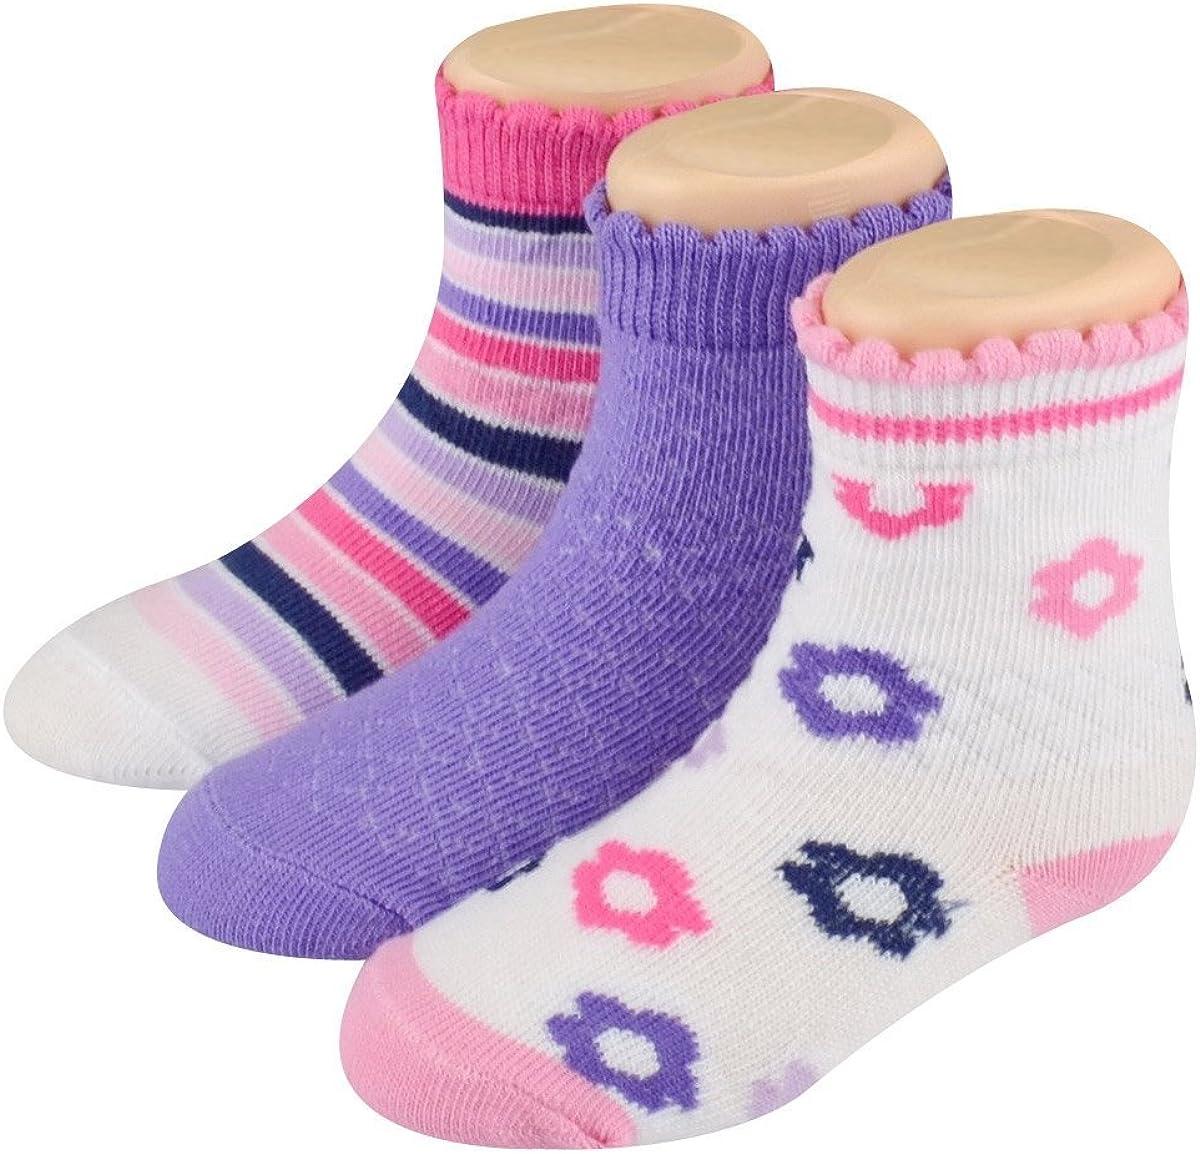 Stride Rite Socks Girls Infant Layla Floral & Stripes Asst. 3pair